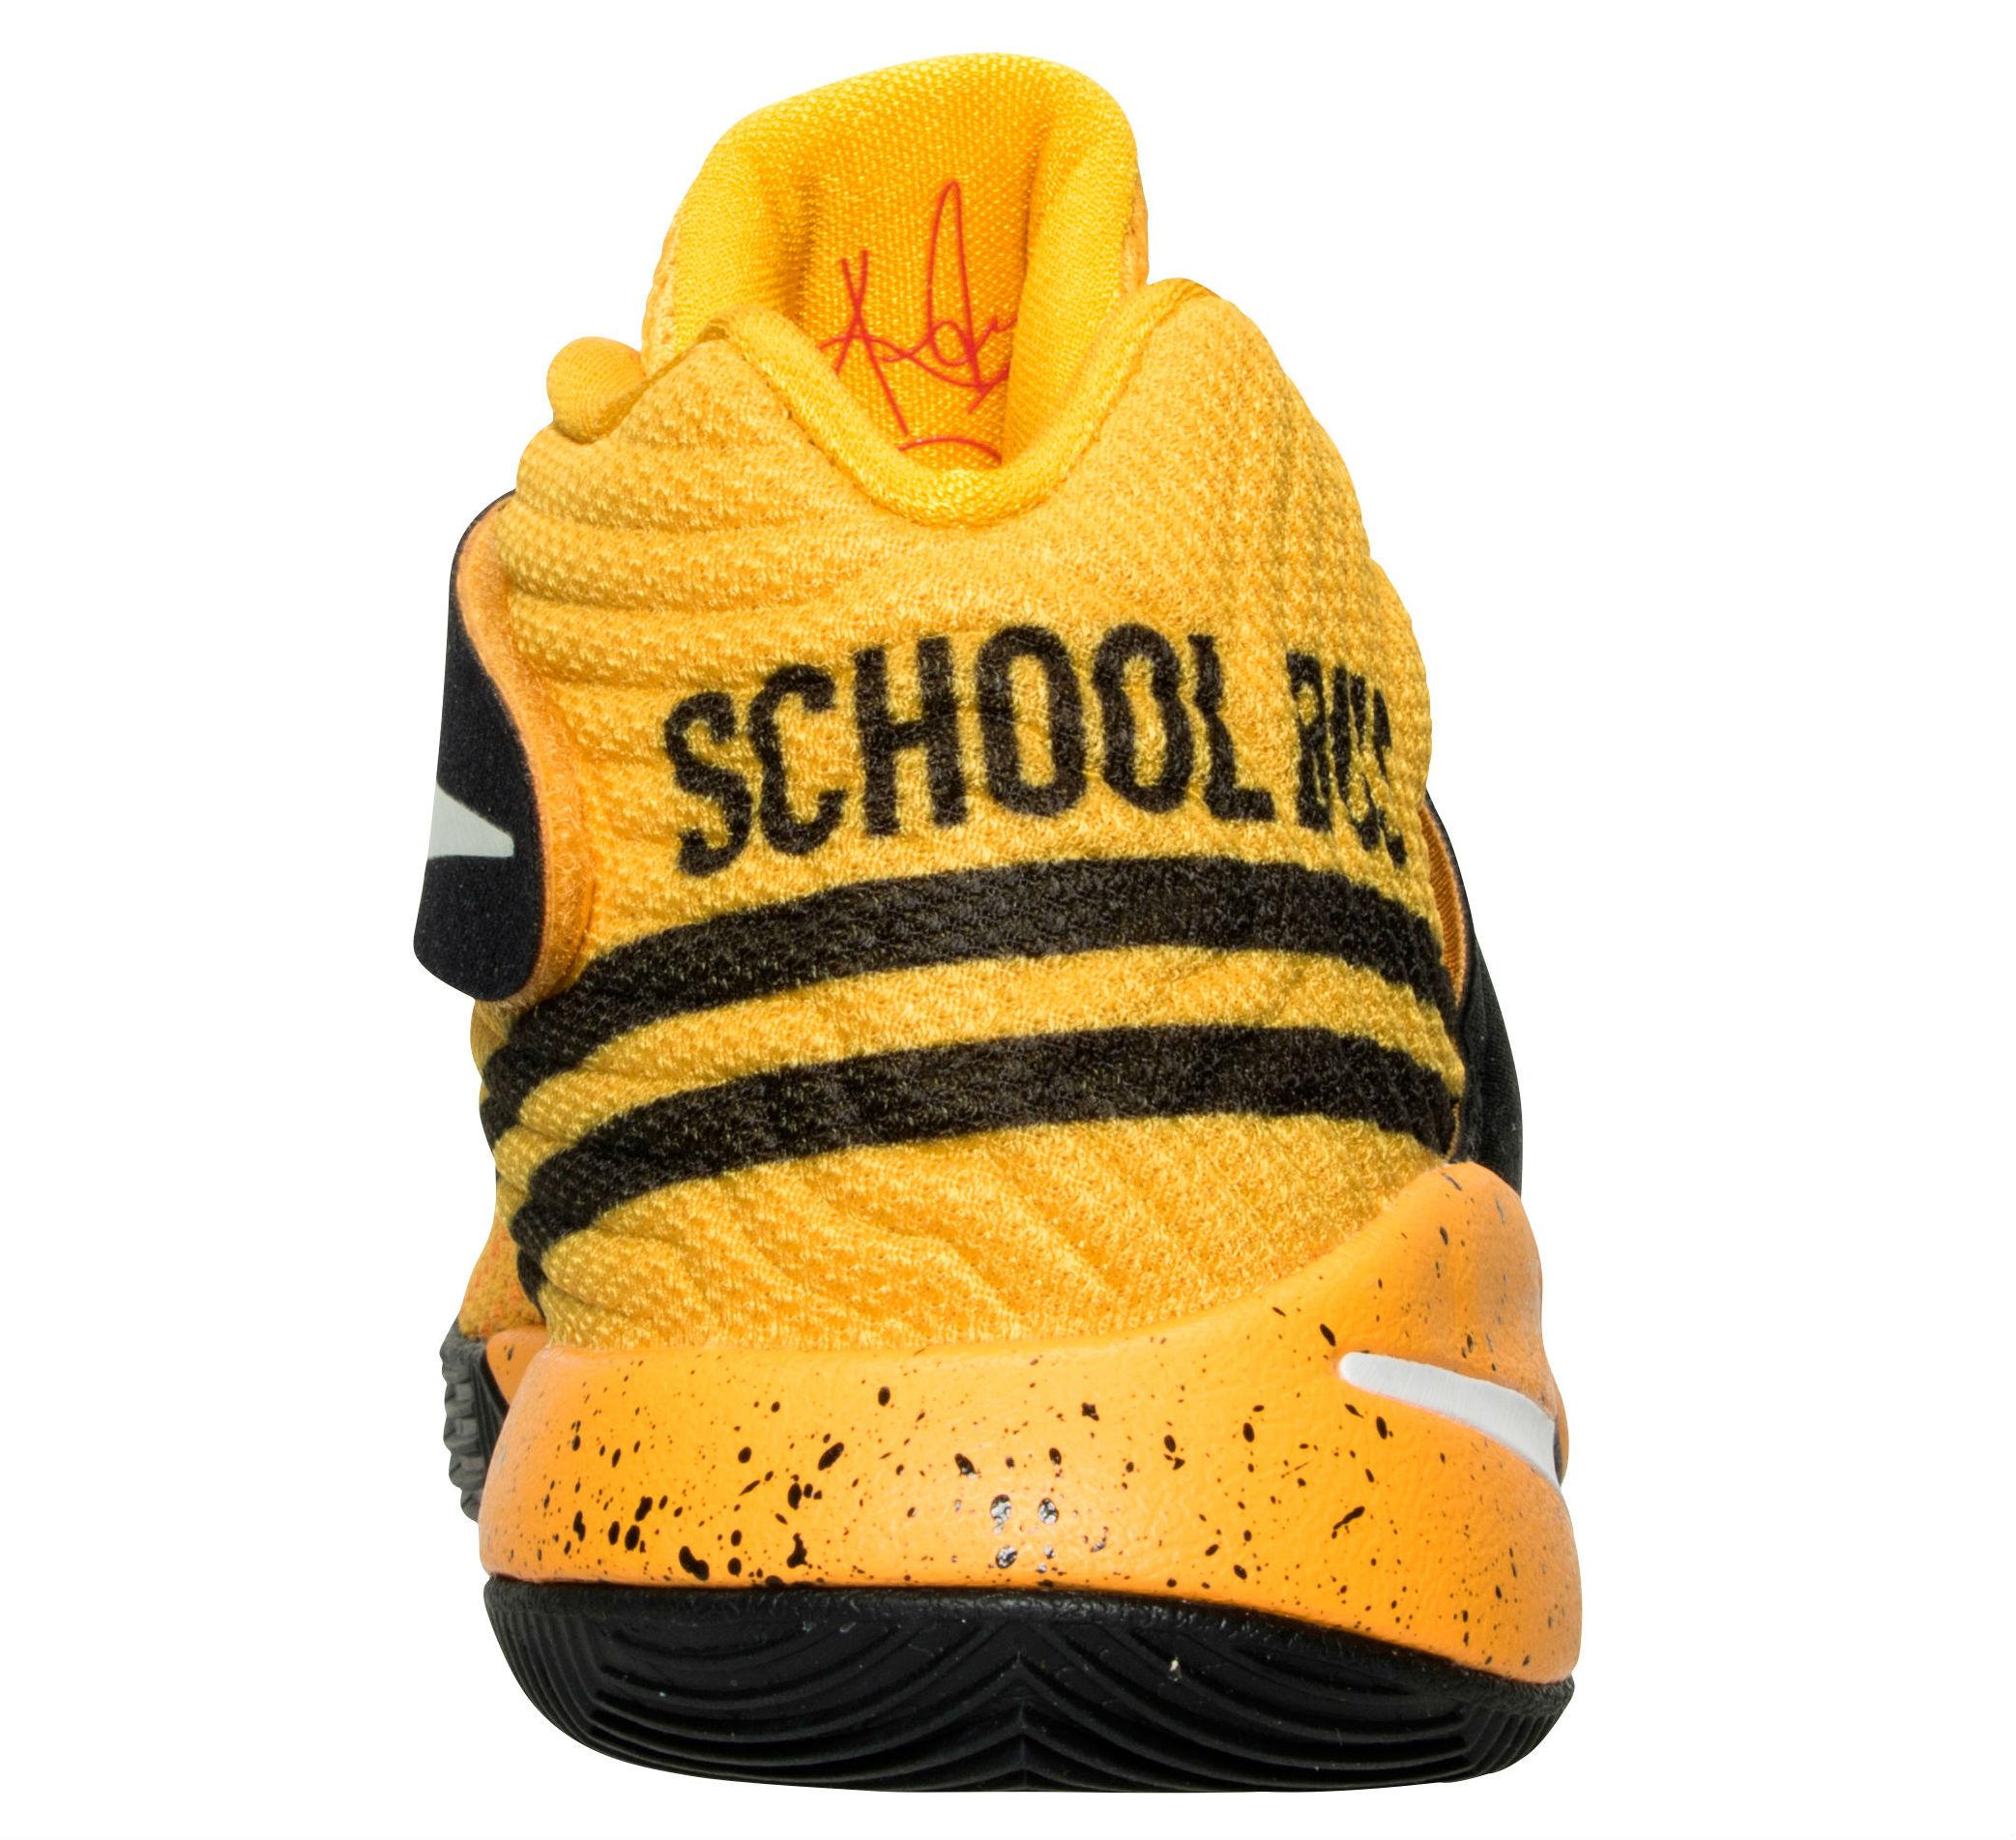 Nike Kyrie 2 School Bus | Sole Collector